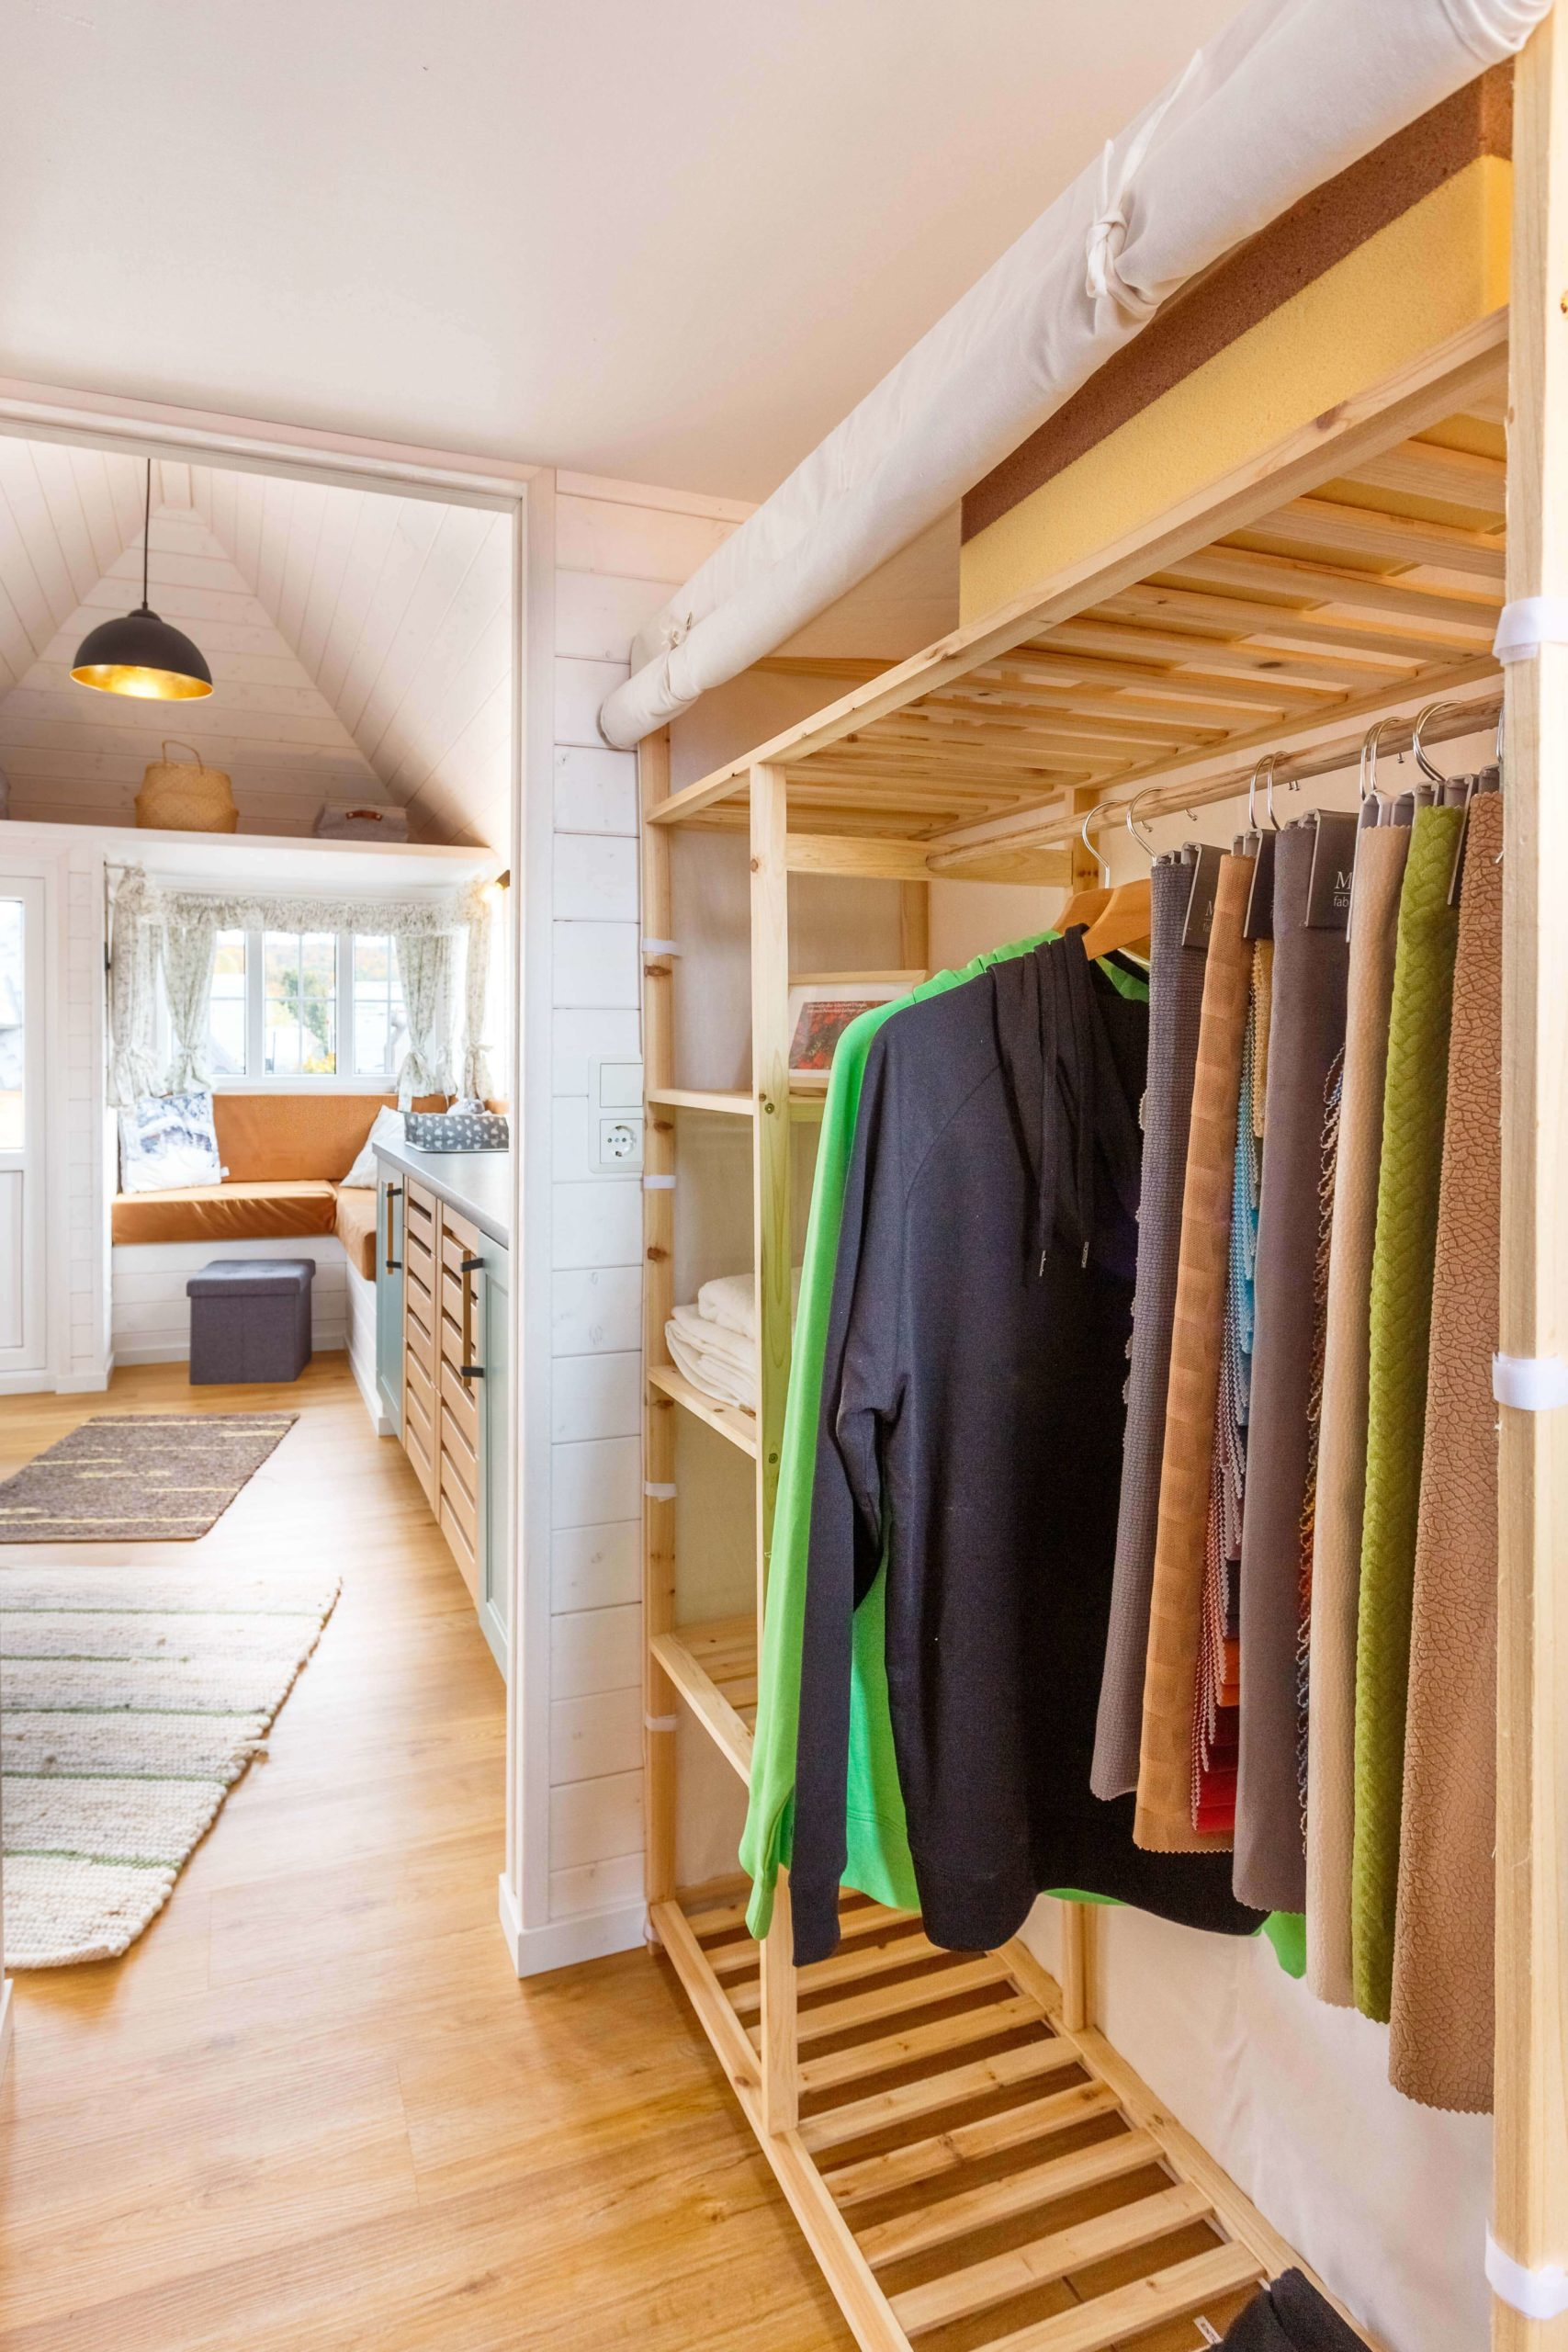 mobiles-tiny-house-schweden-vital-camp-gmbh-50